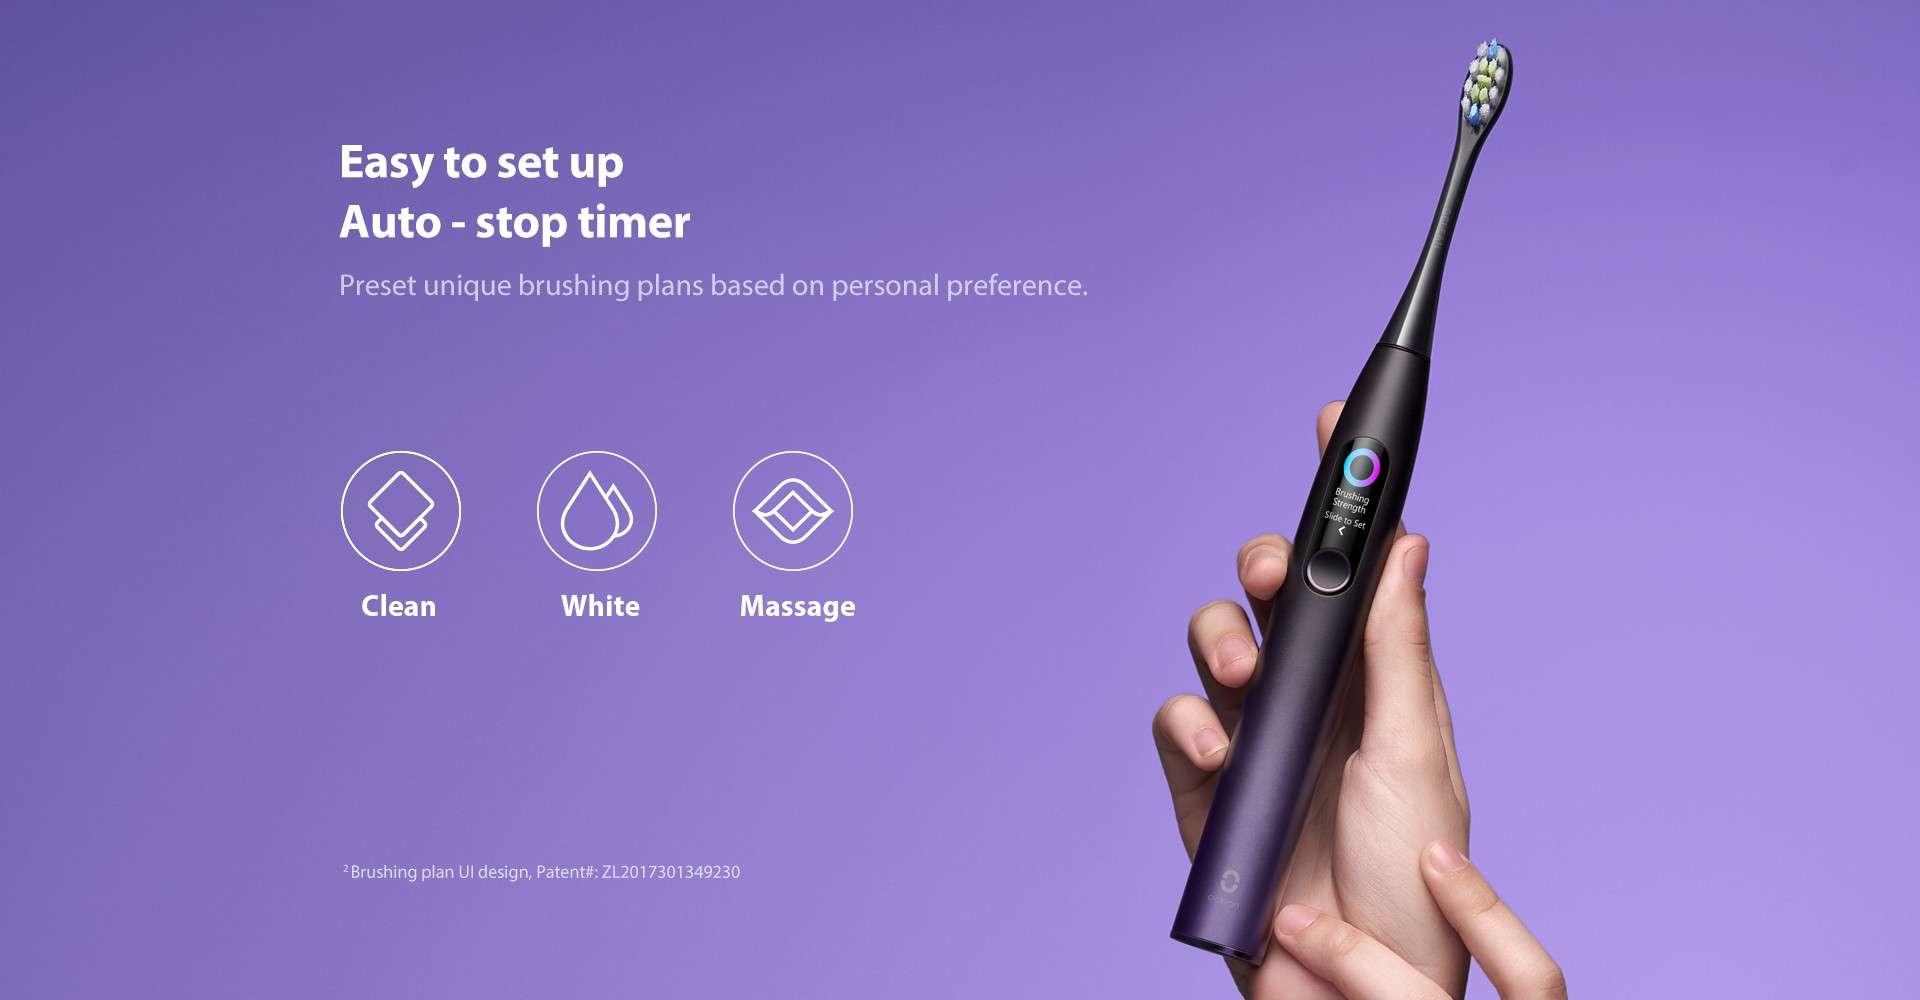 Periuta Electrica Smart Xiaomi Oclean X Pro, Display, Touchscreen, 32 Intensitati, pink 5